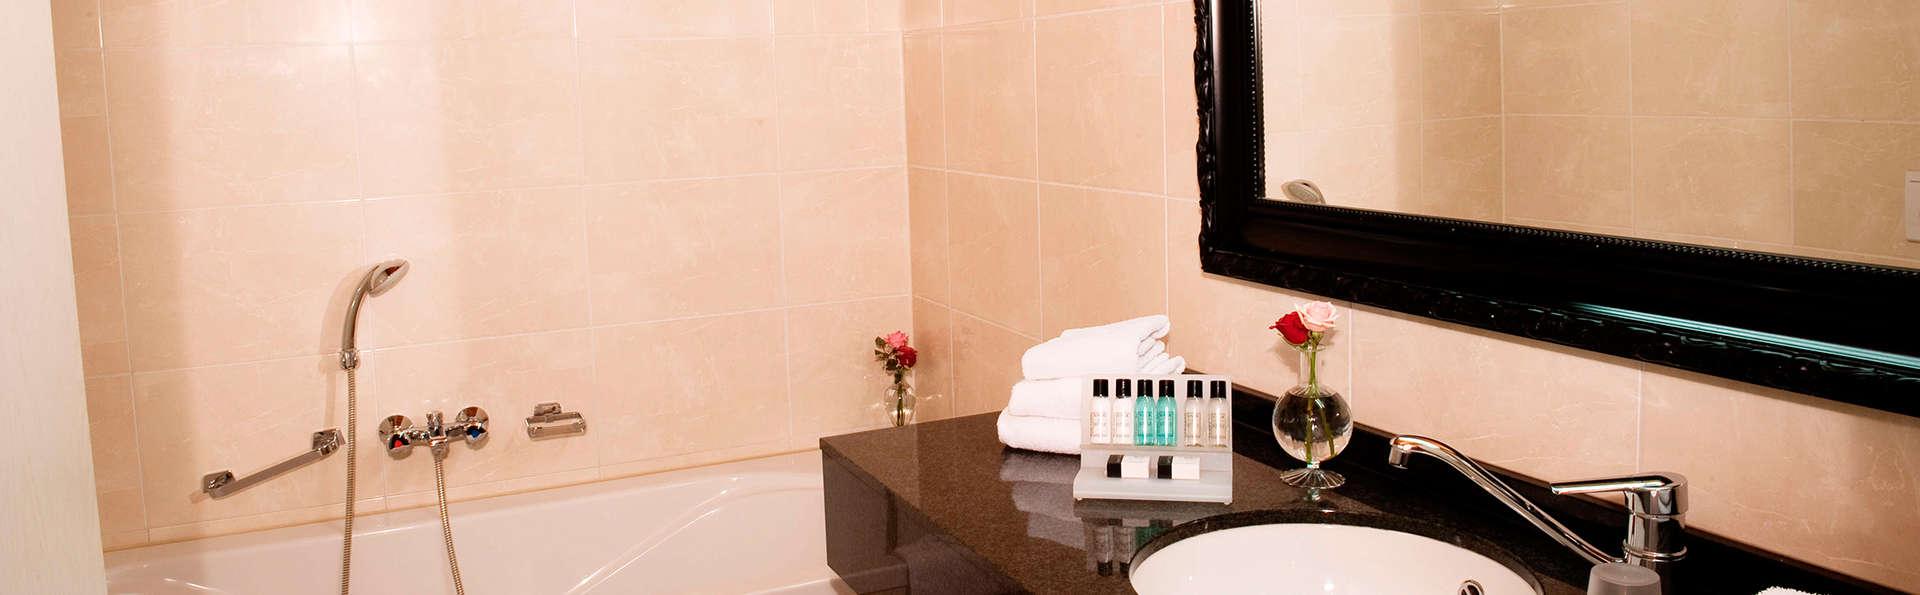 Van der Valk Hotel Schiphol A4 - EDIT_bathroom4.jpg